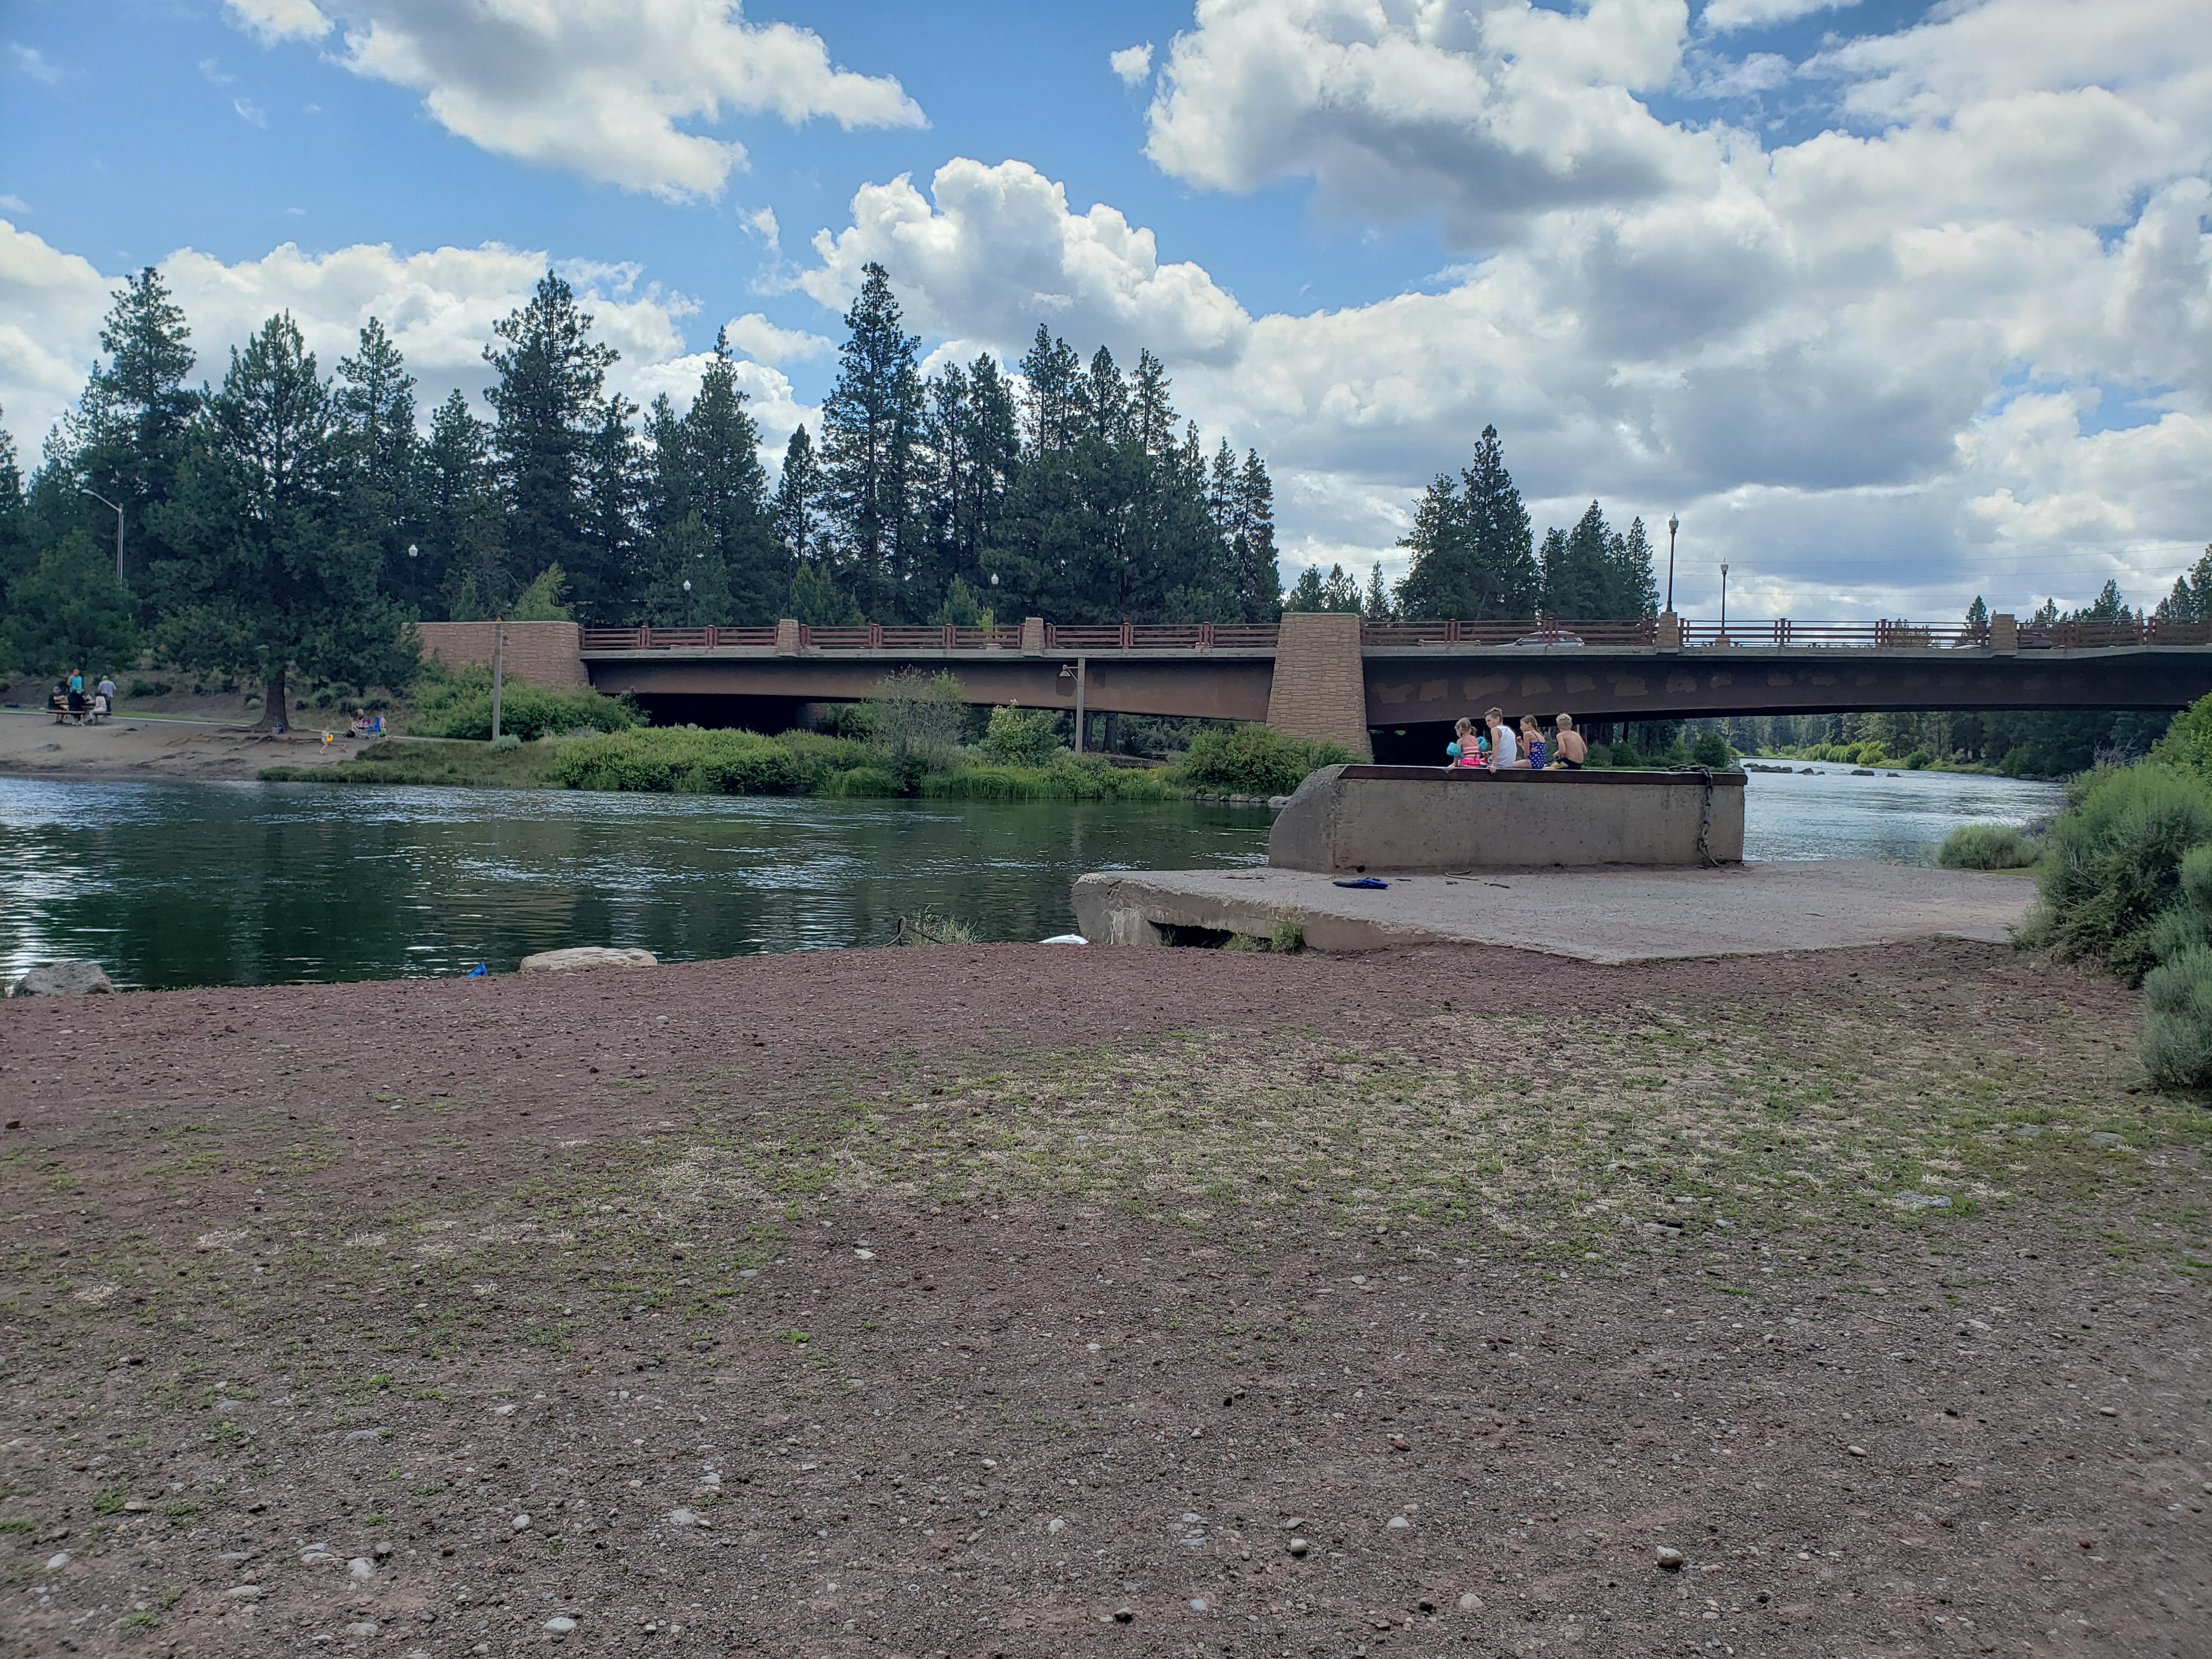 Image of the Deschutes River bank in Farewell Bend Park along the Deschutes River Trail.